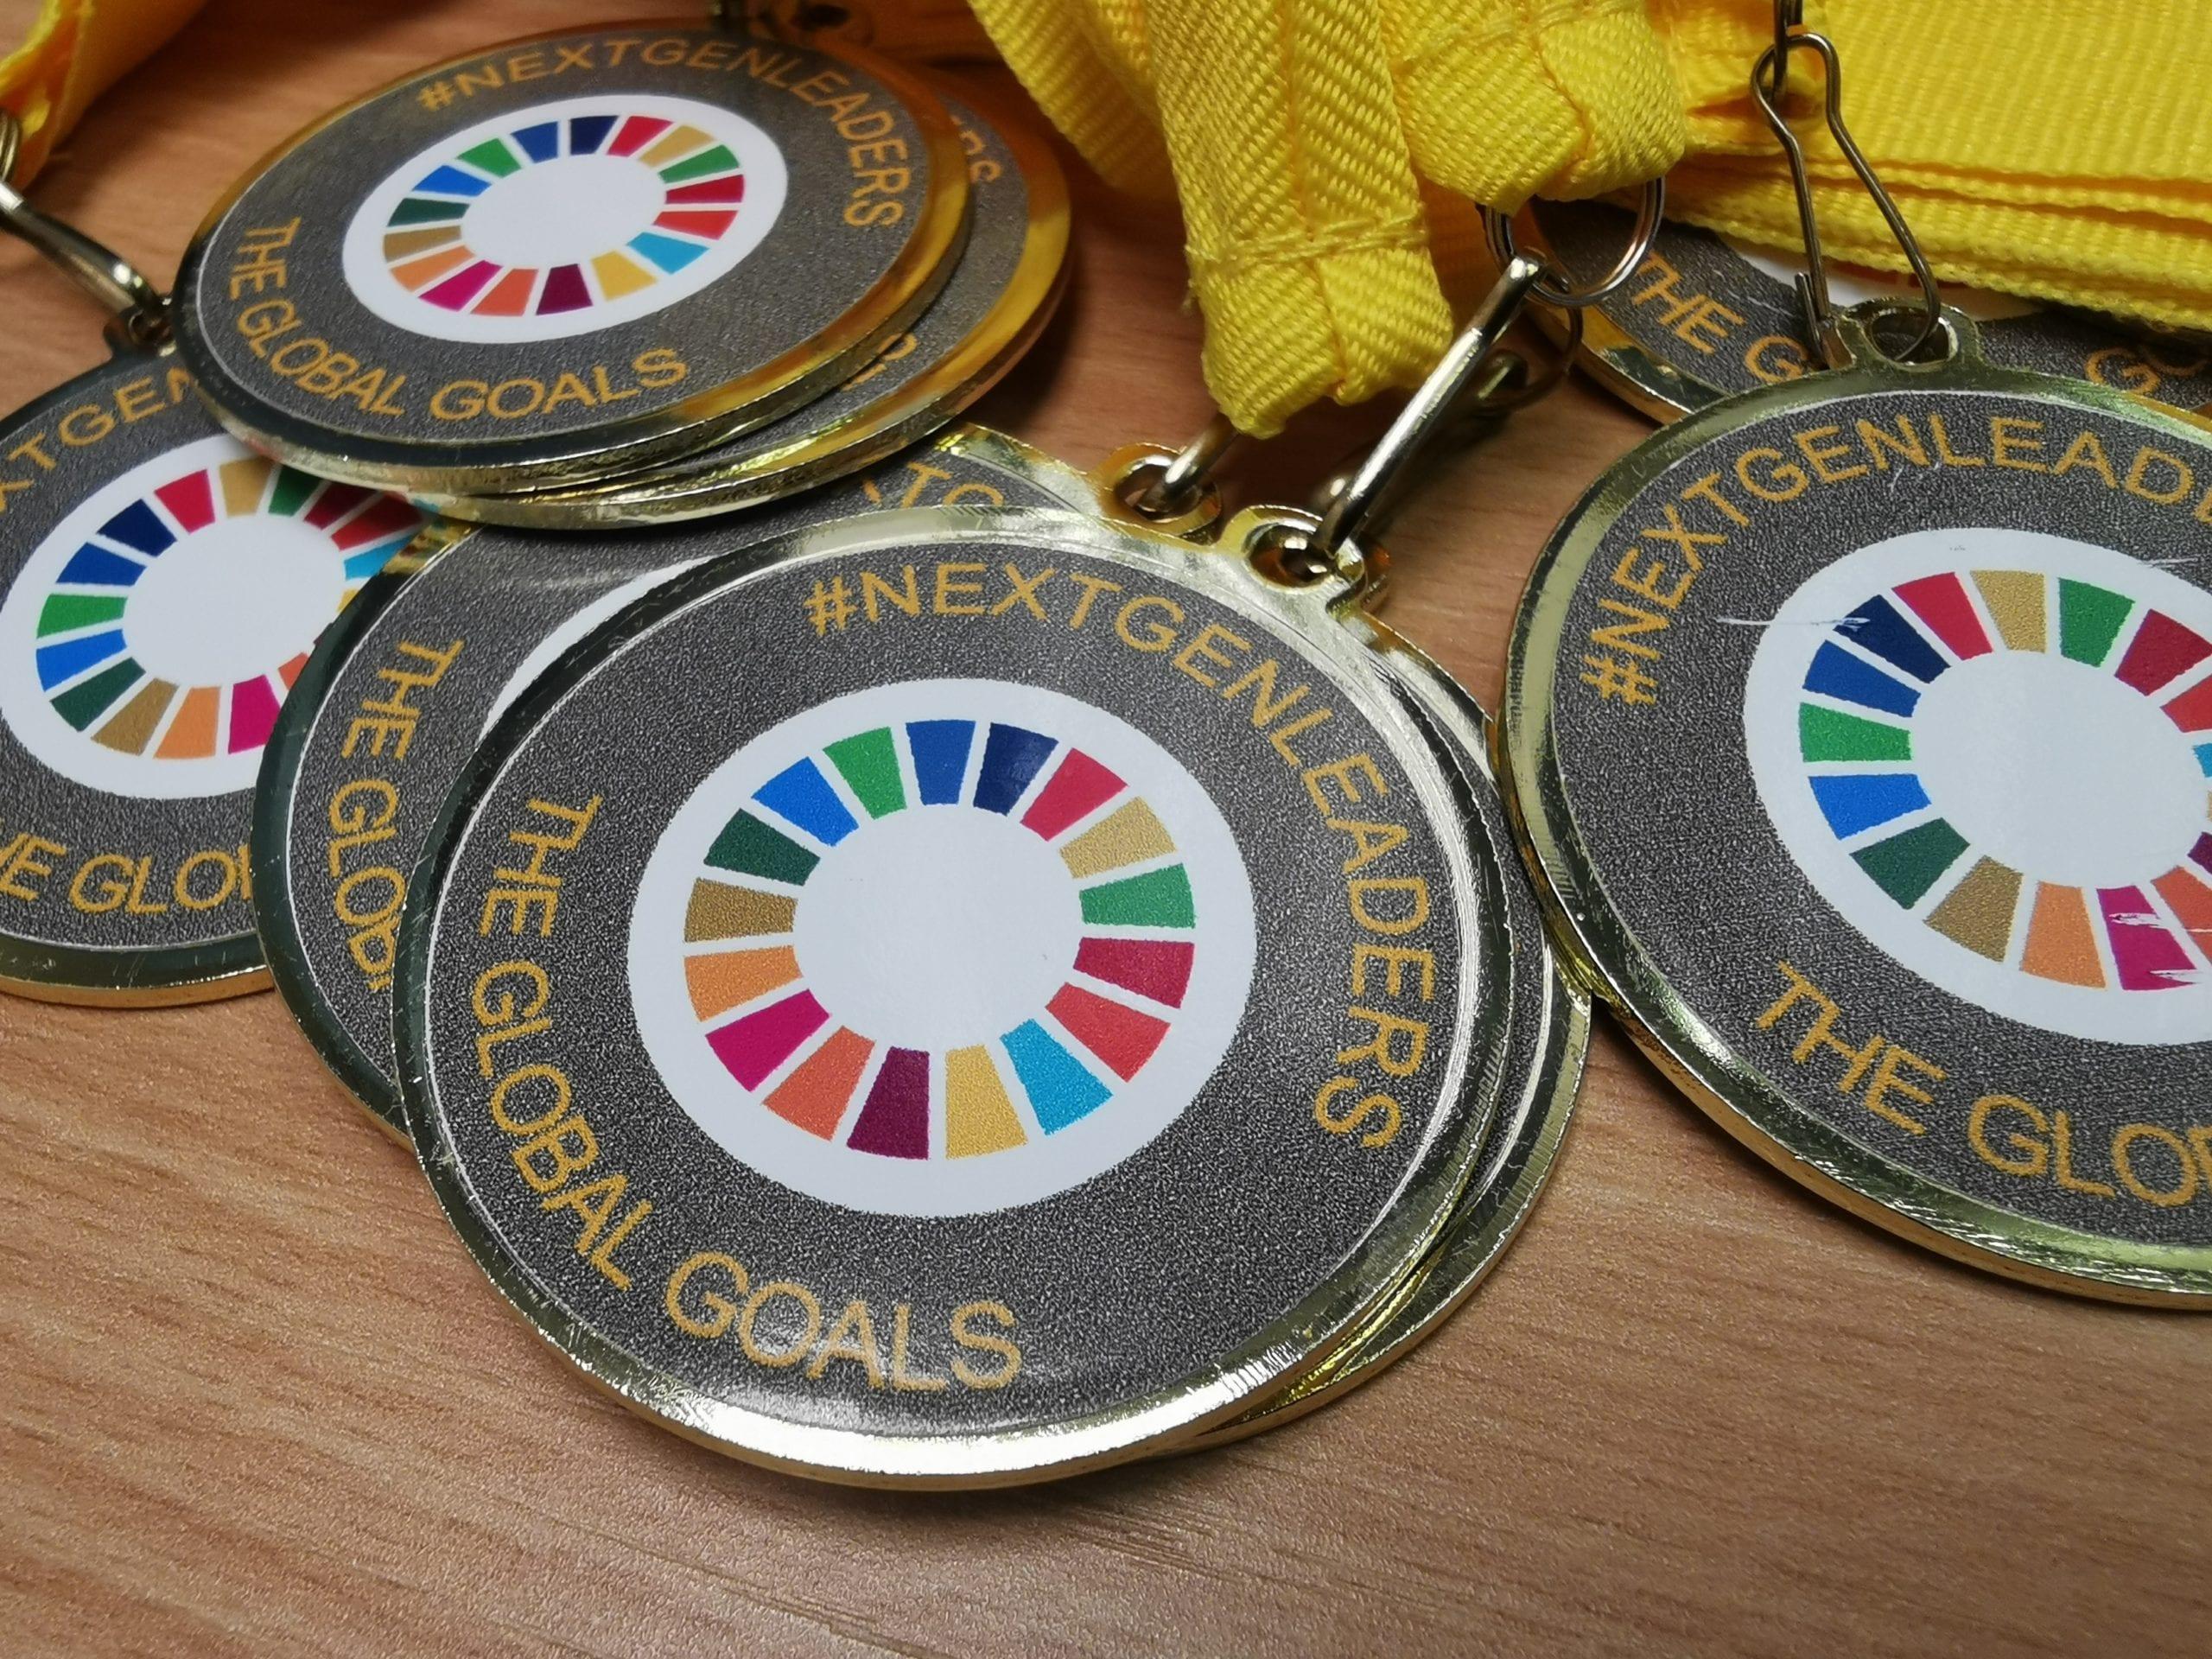 Year 13 students win Best Community Partnership award